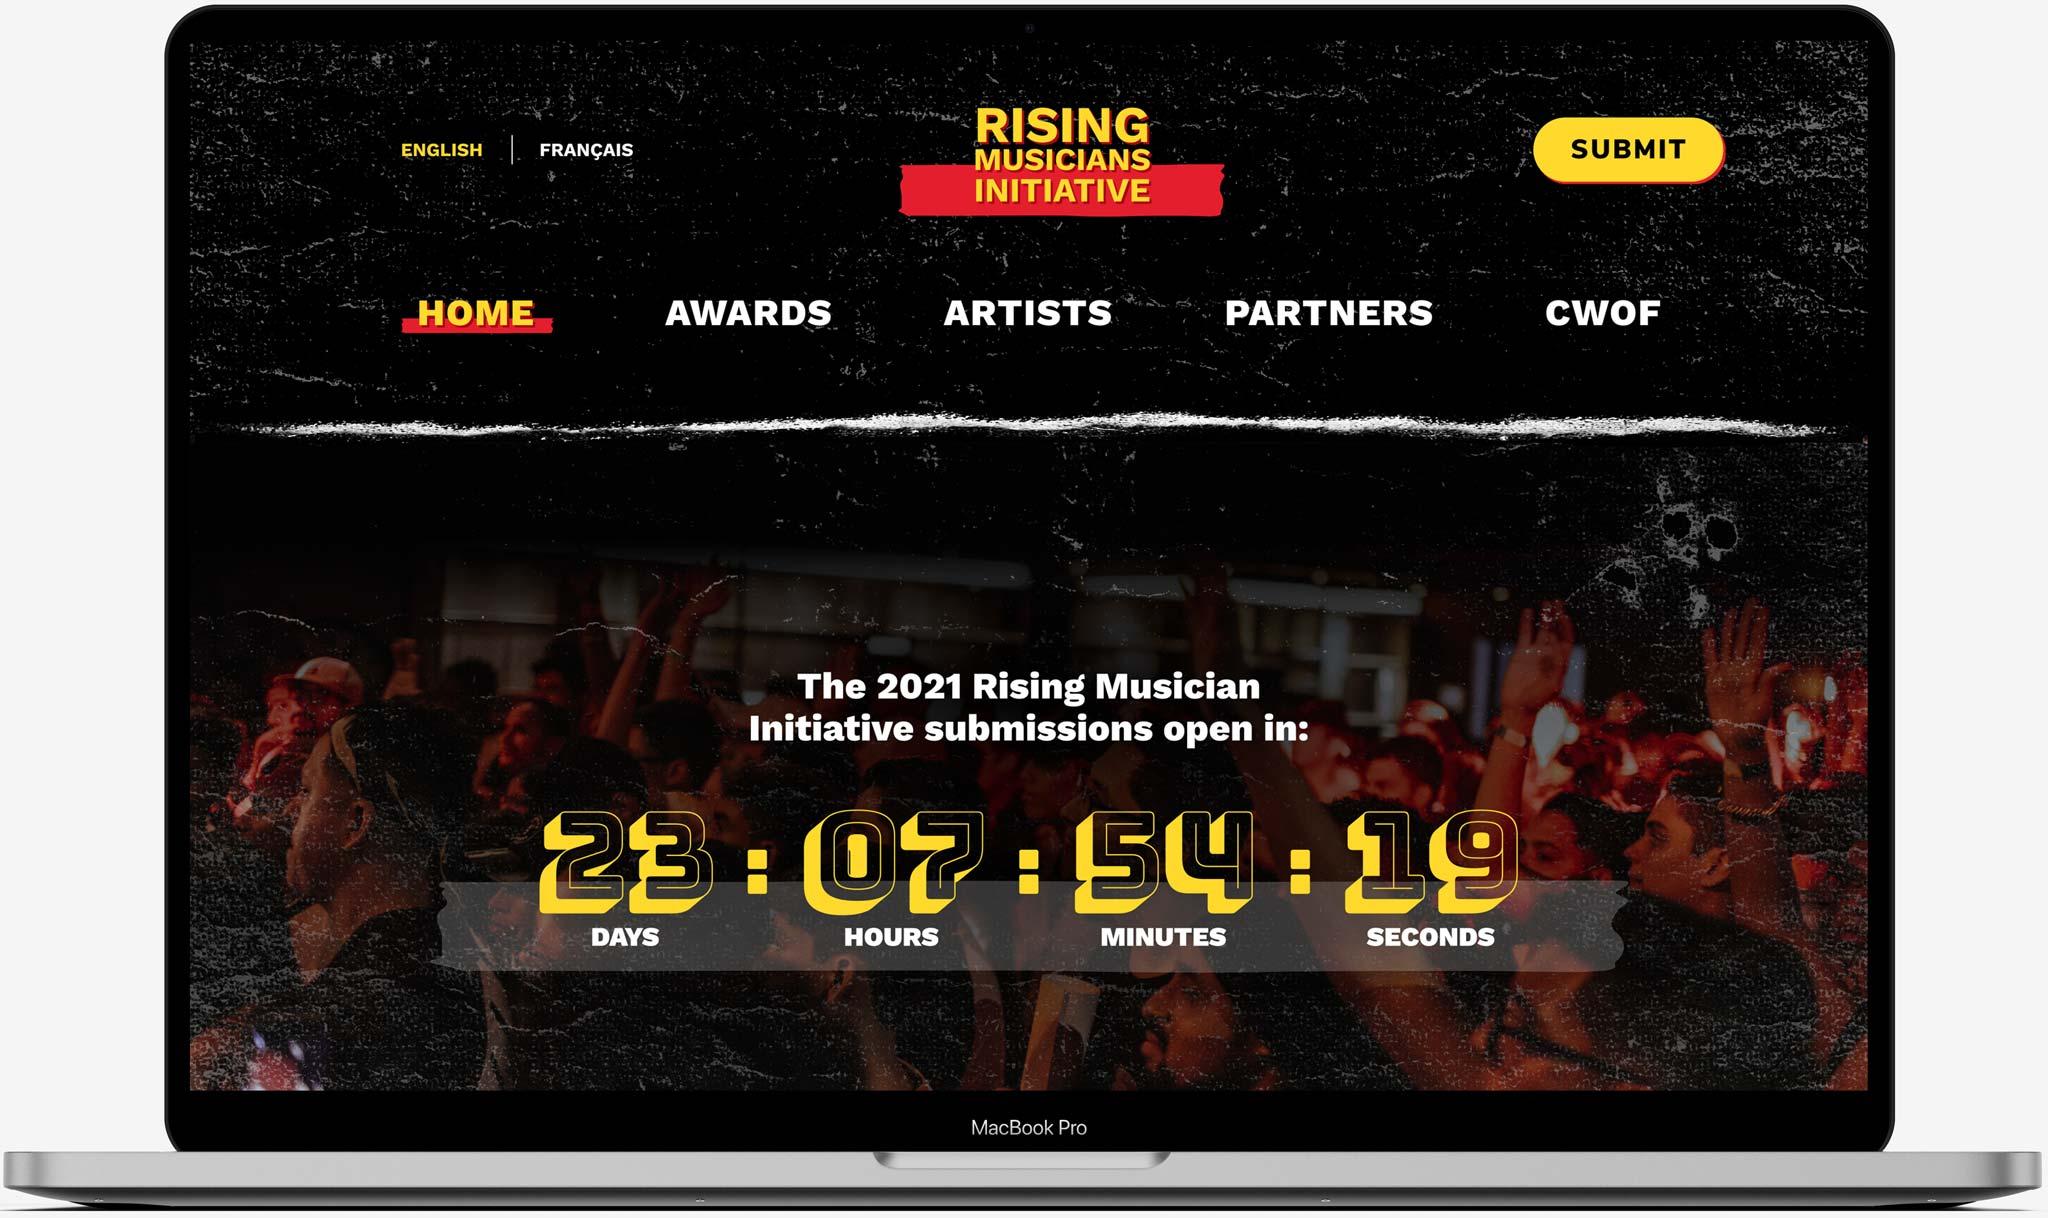 RMI homepage screen